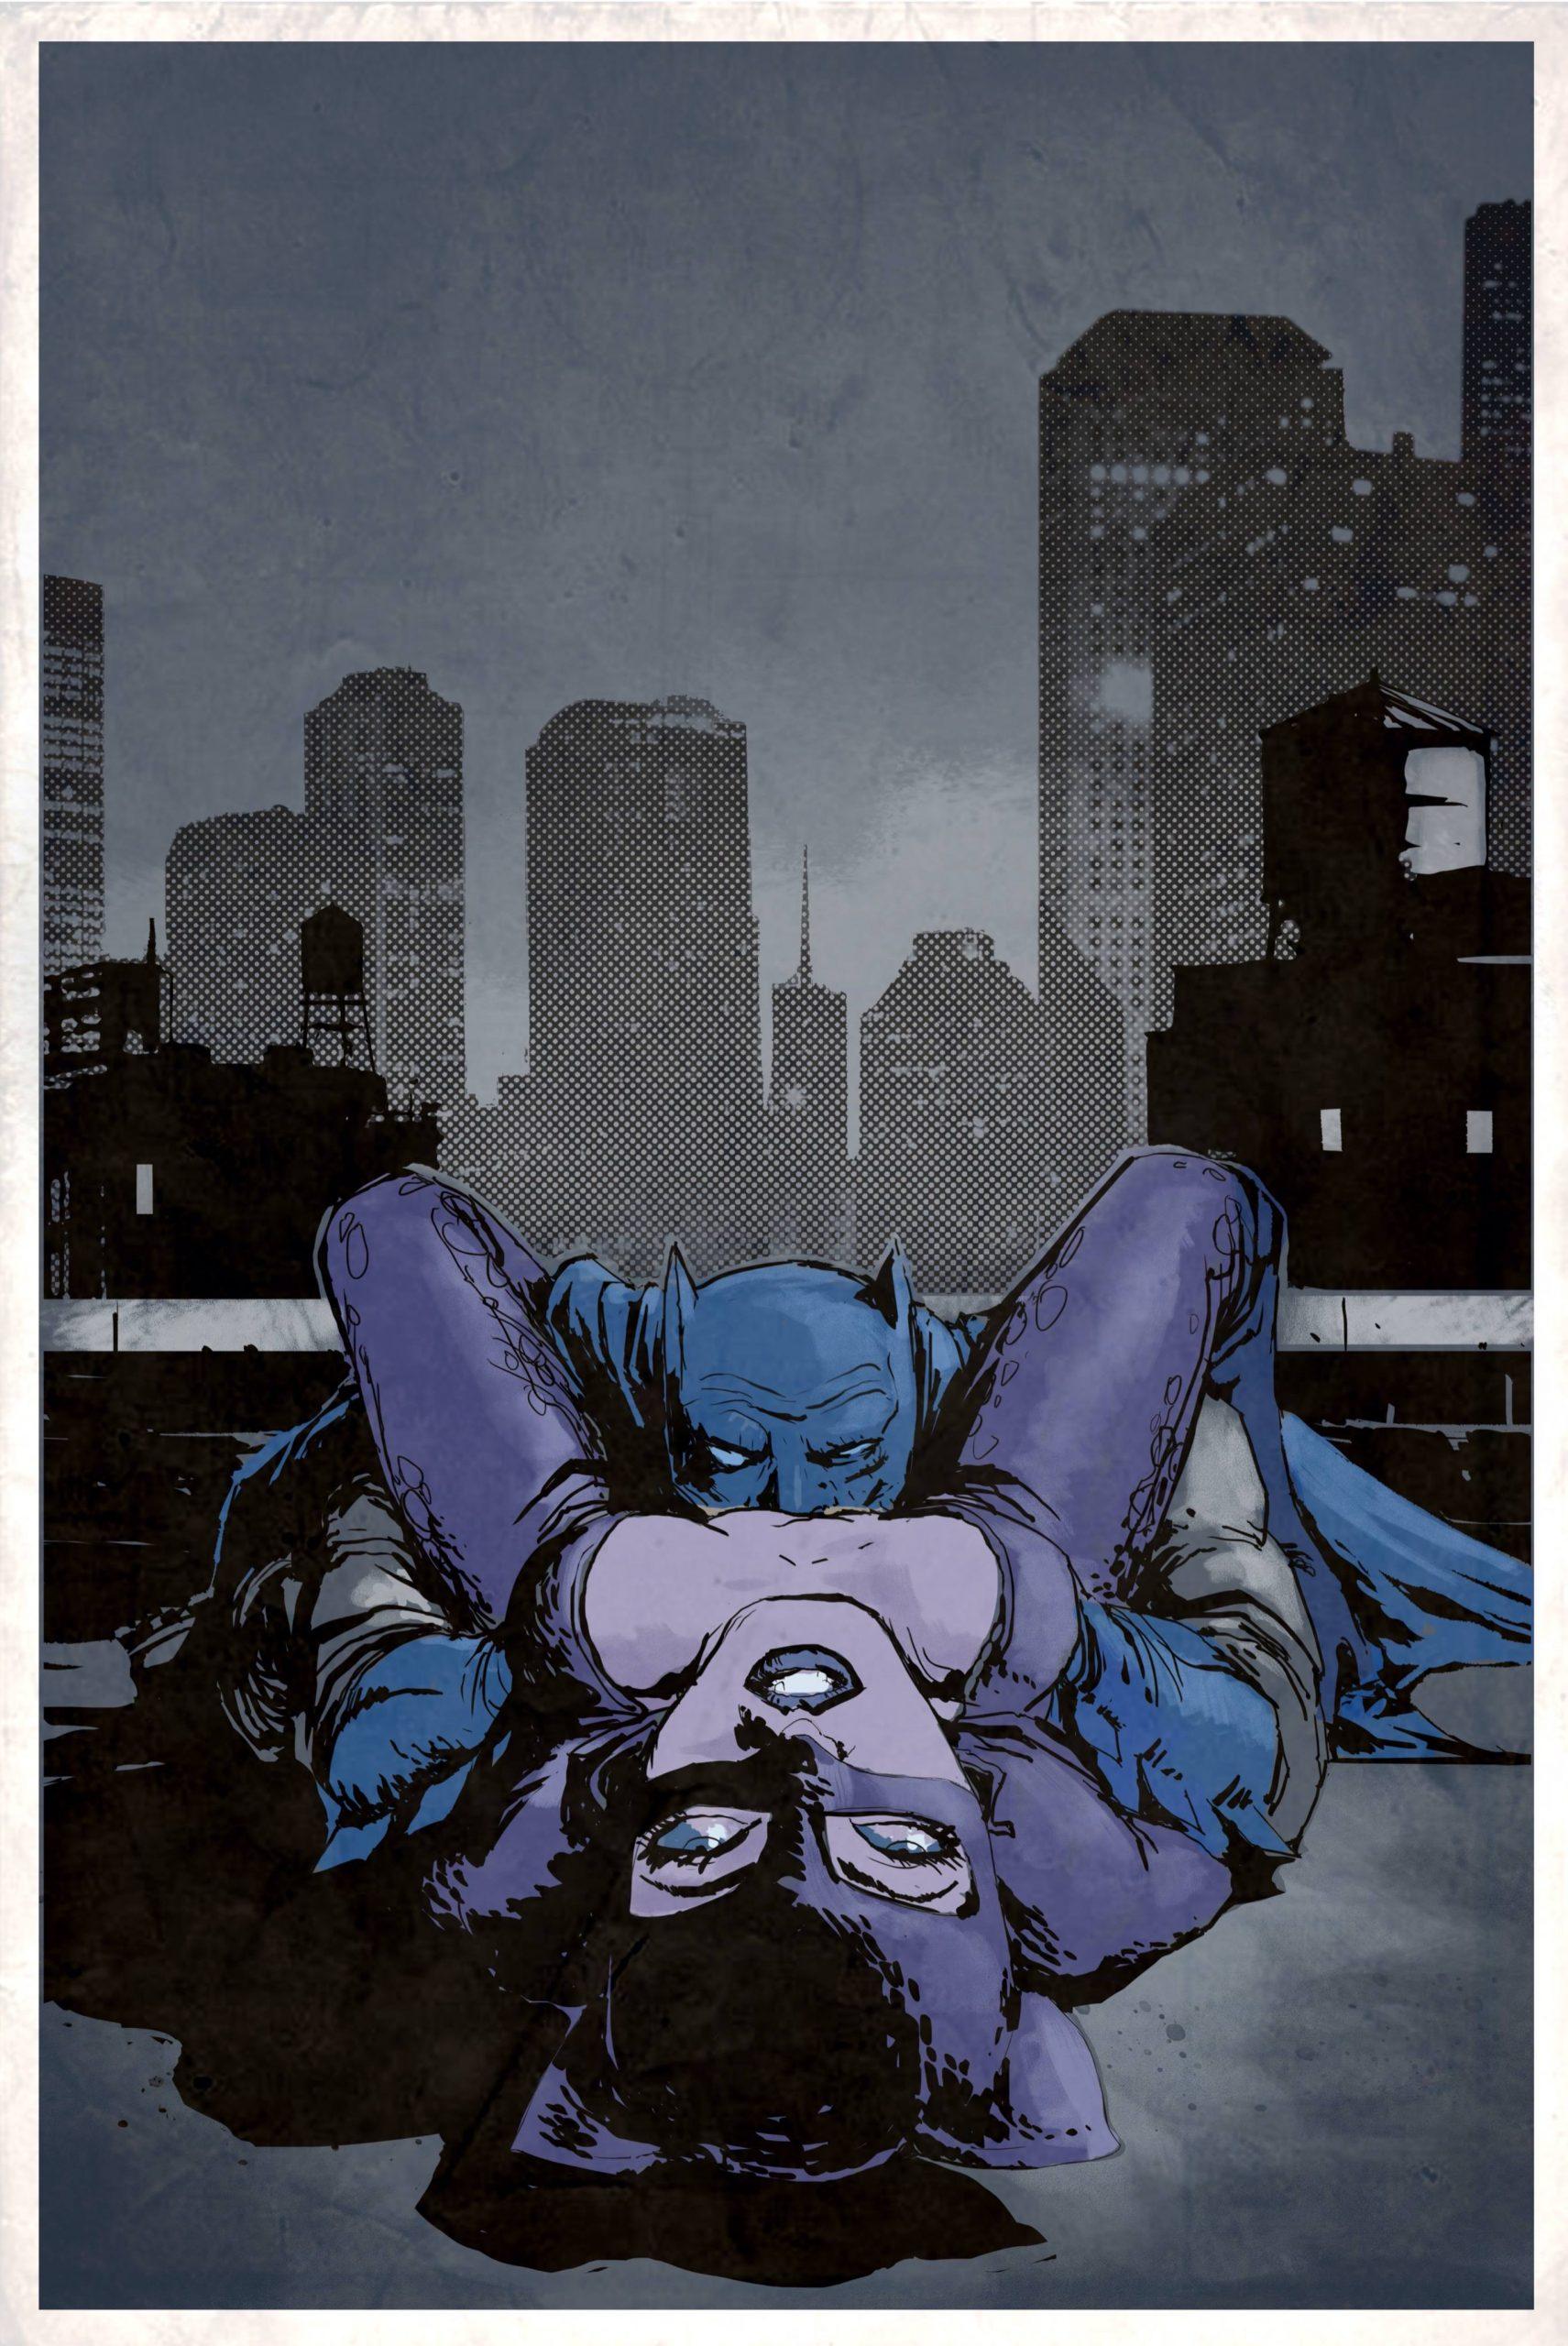 Batman Catwoman, Zack Snyder